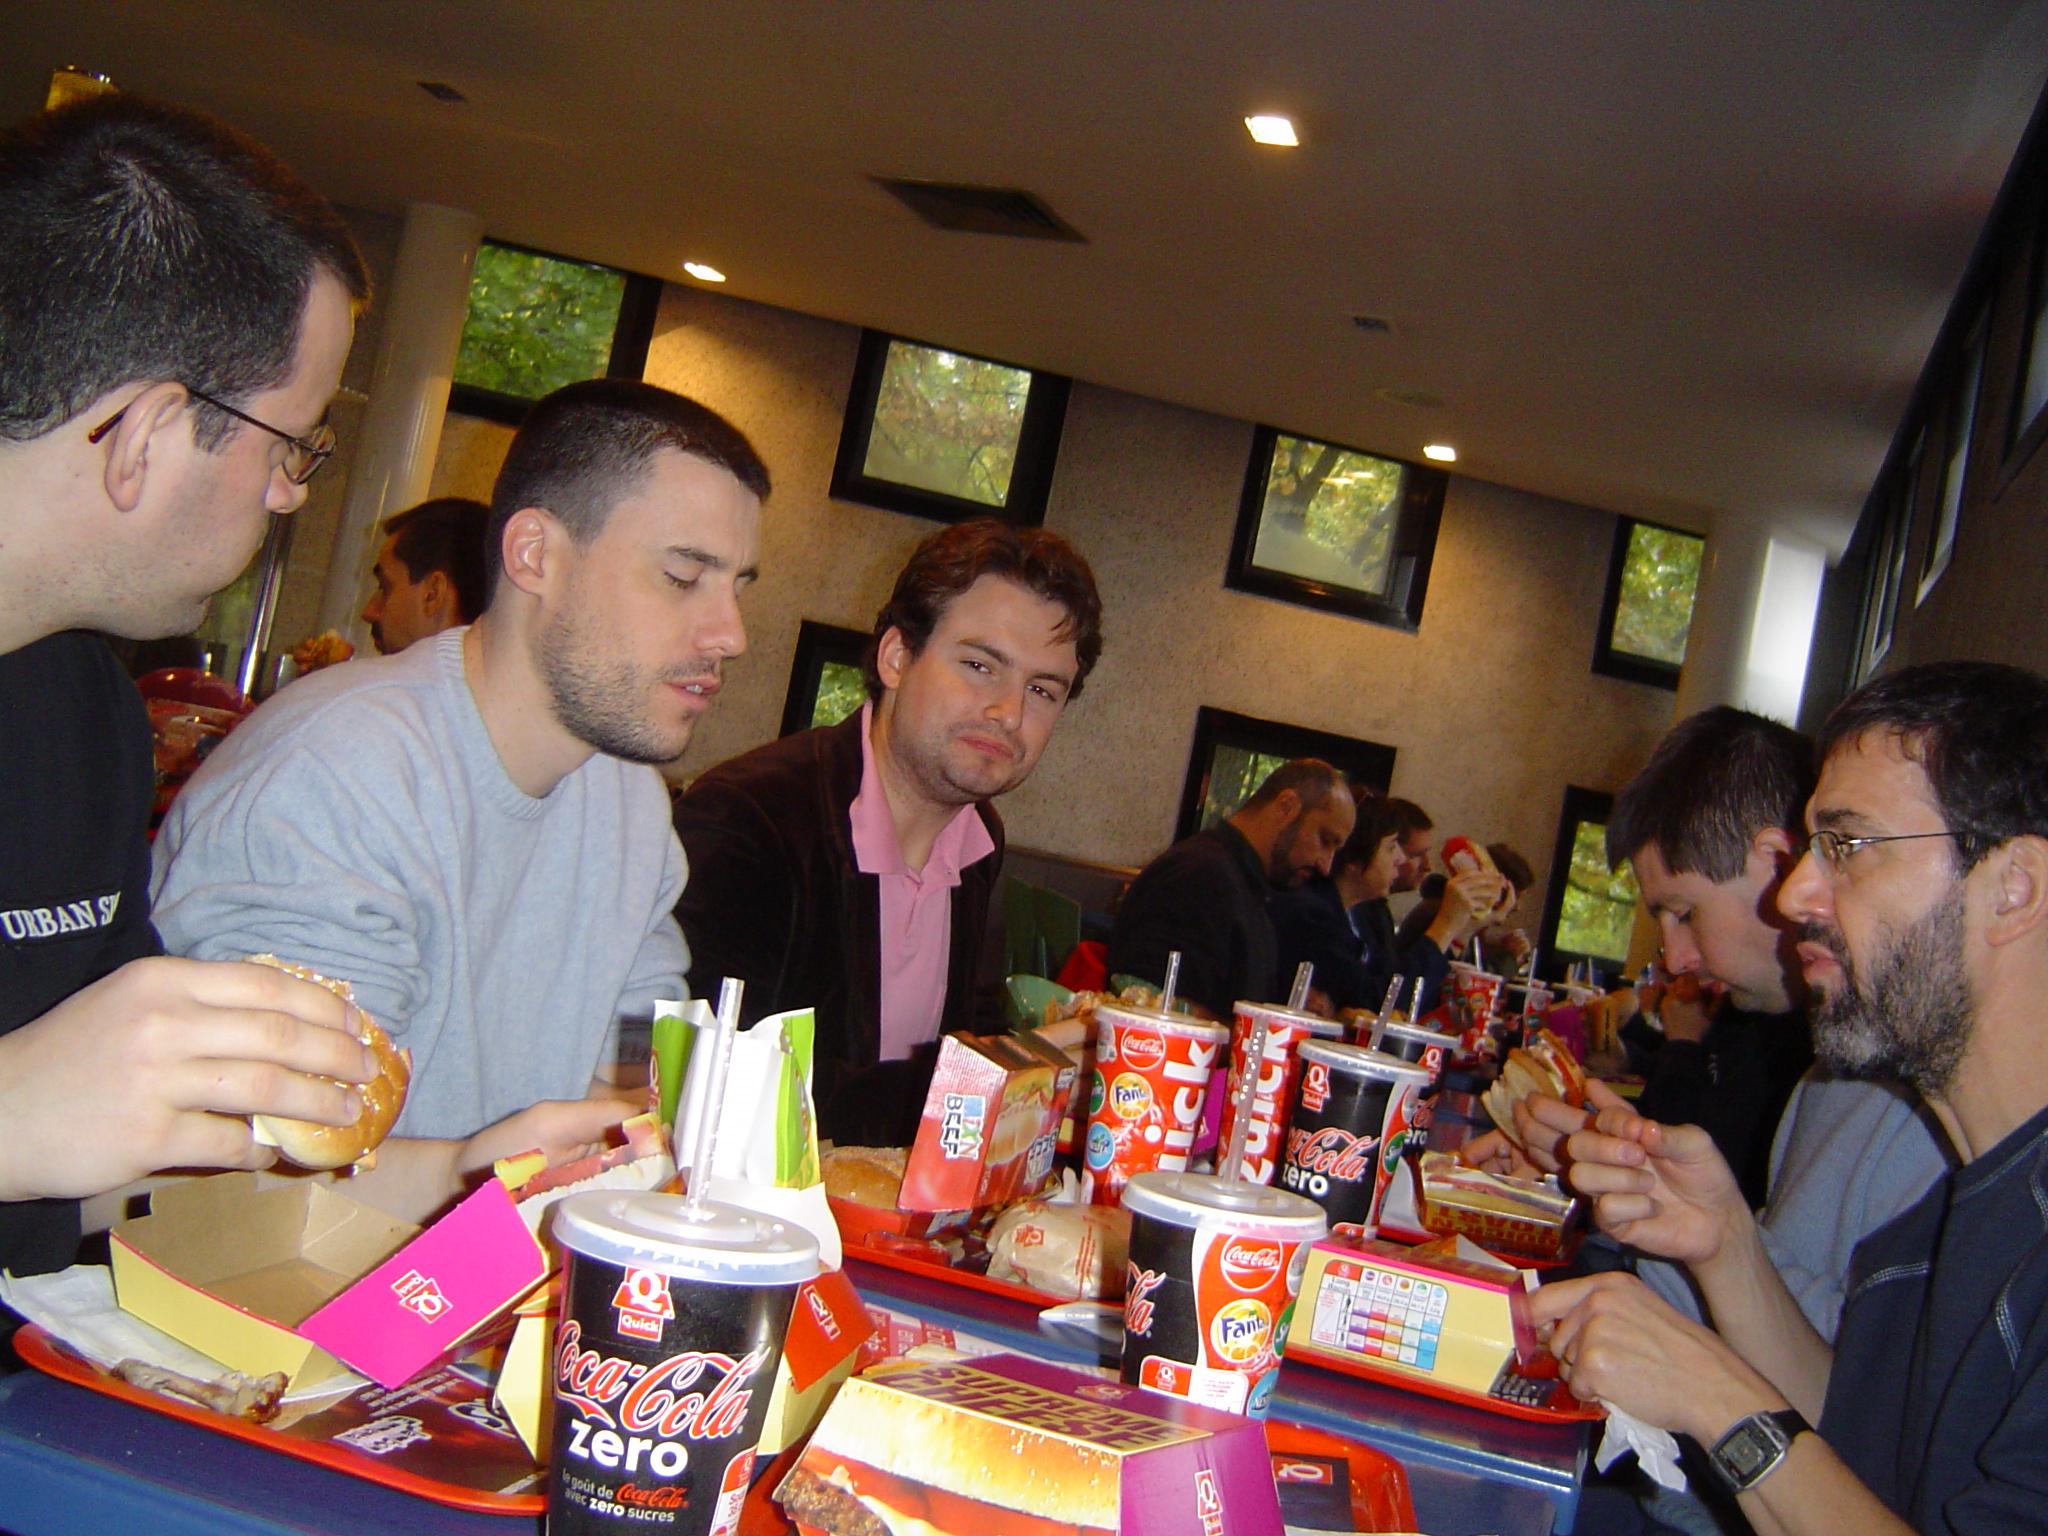 Photo 36 - Vive la gastronomie française! (Boba.fett7, Joruus29, Ajunta Pall, Kardass, c3po75)